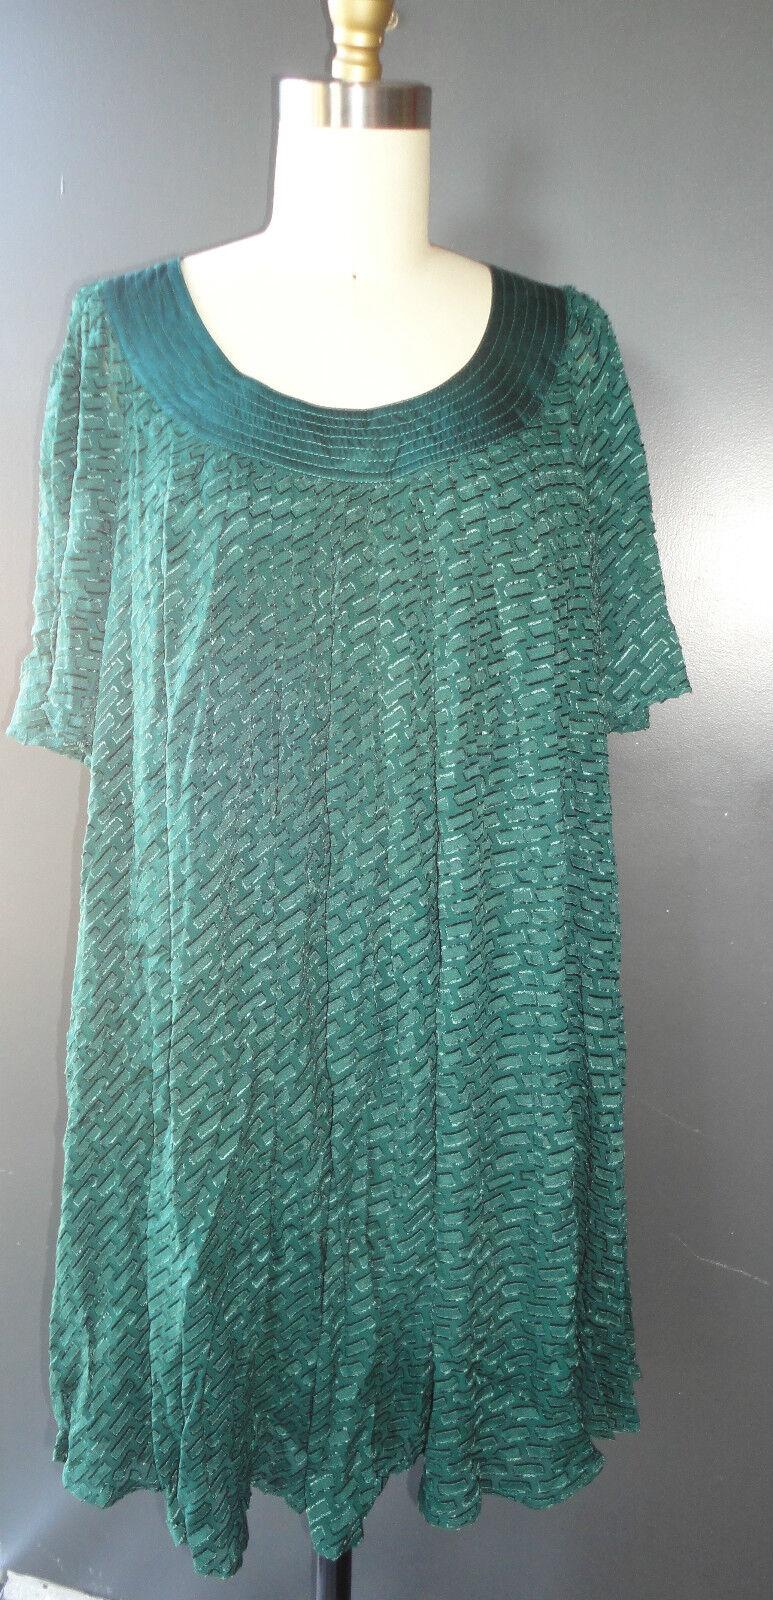 GORGEOUS CATHERINE MALANDRINO Dark Teal Grün Silk jacquard Dress 4 S